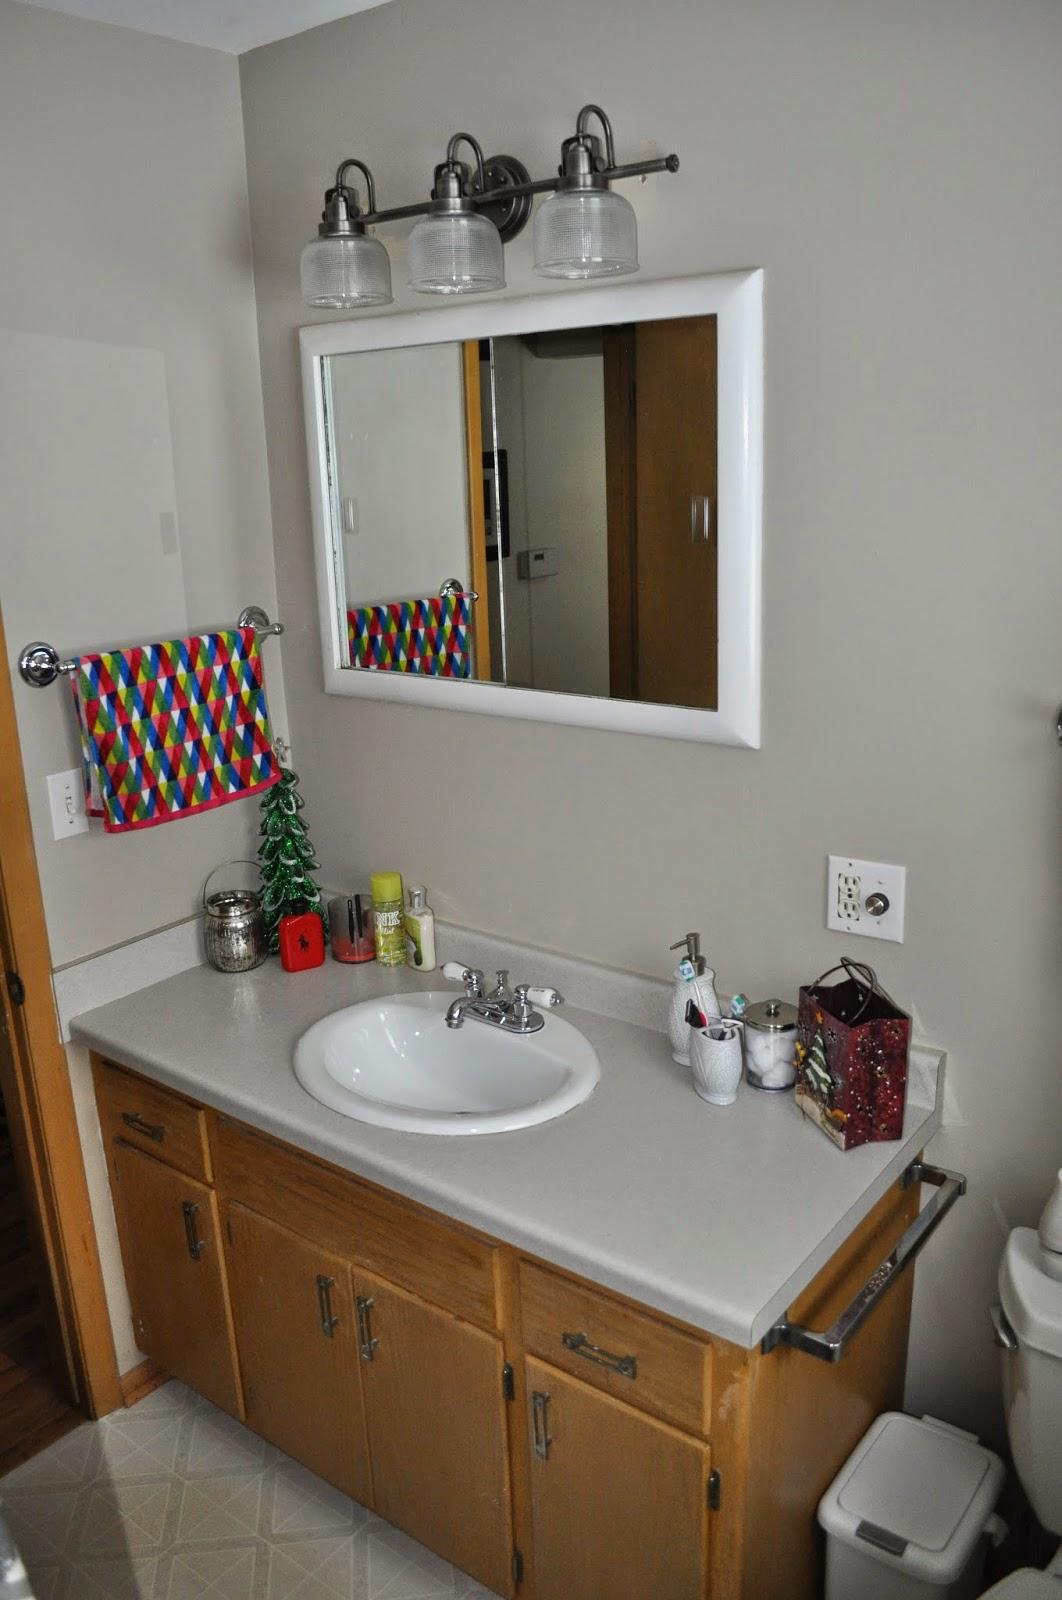 Carri us home bathroom updates - Eggshell paint in bathroom ...